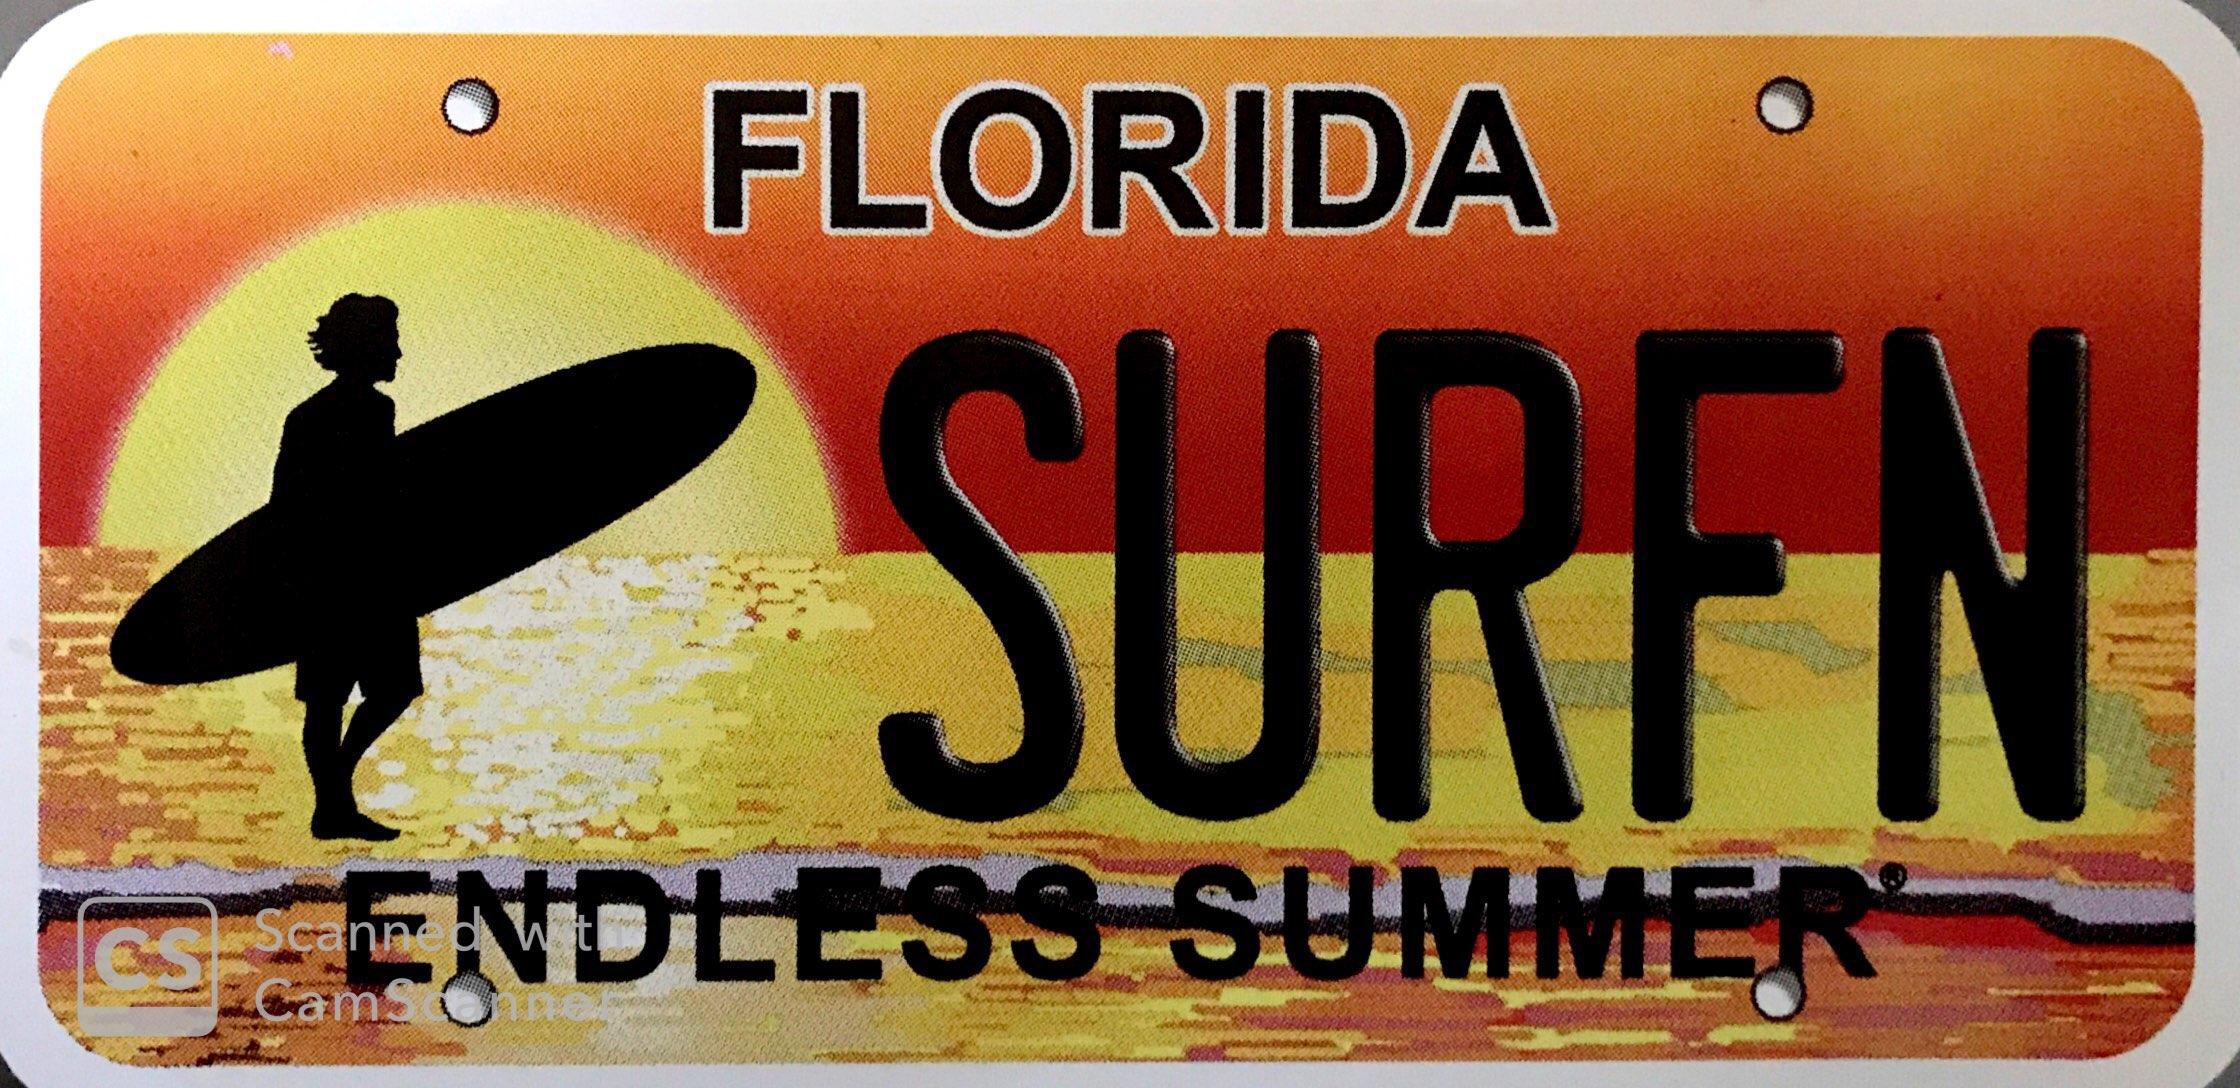 Surfing Logo.jpg